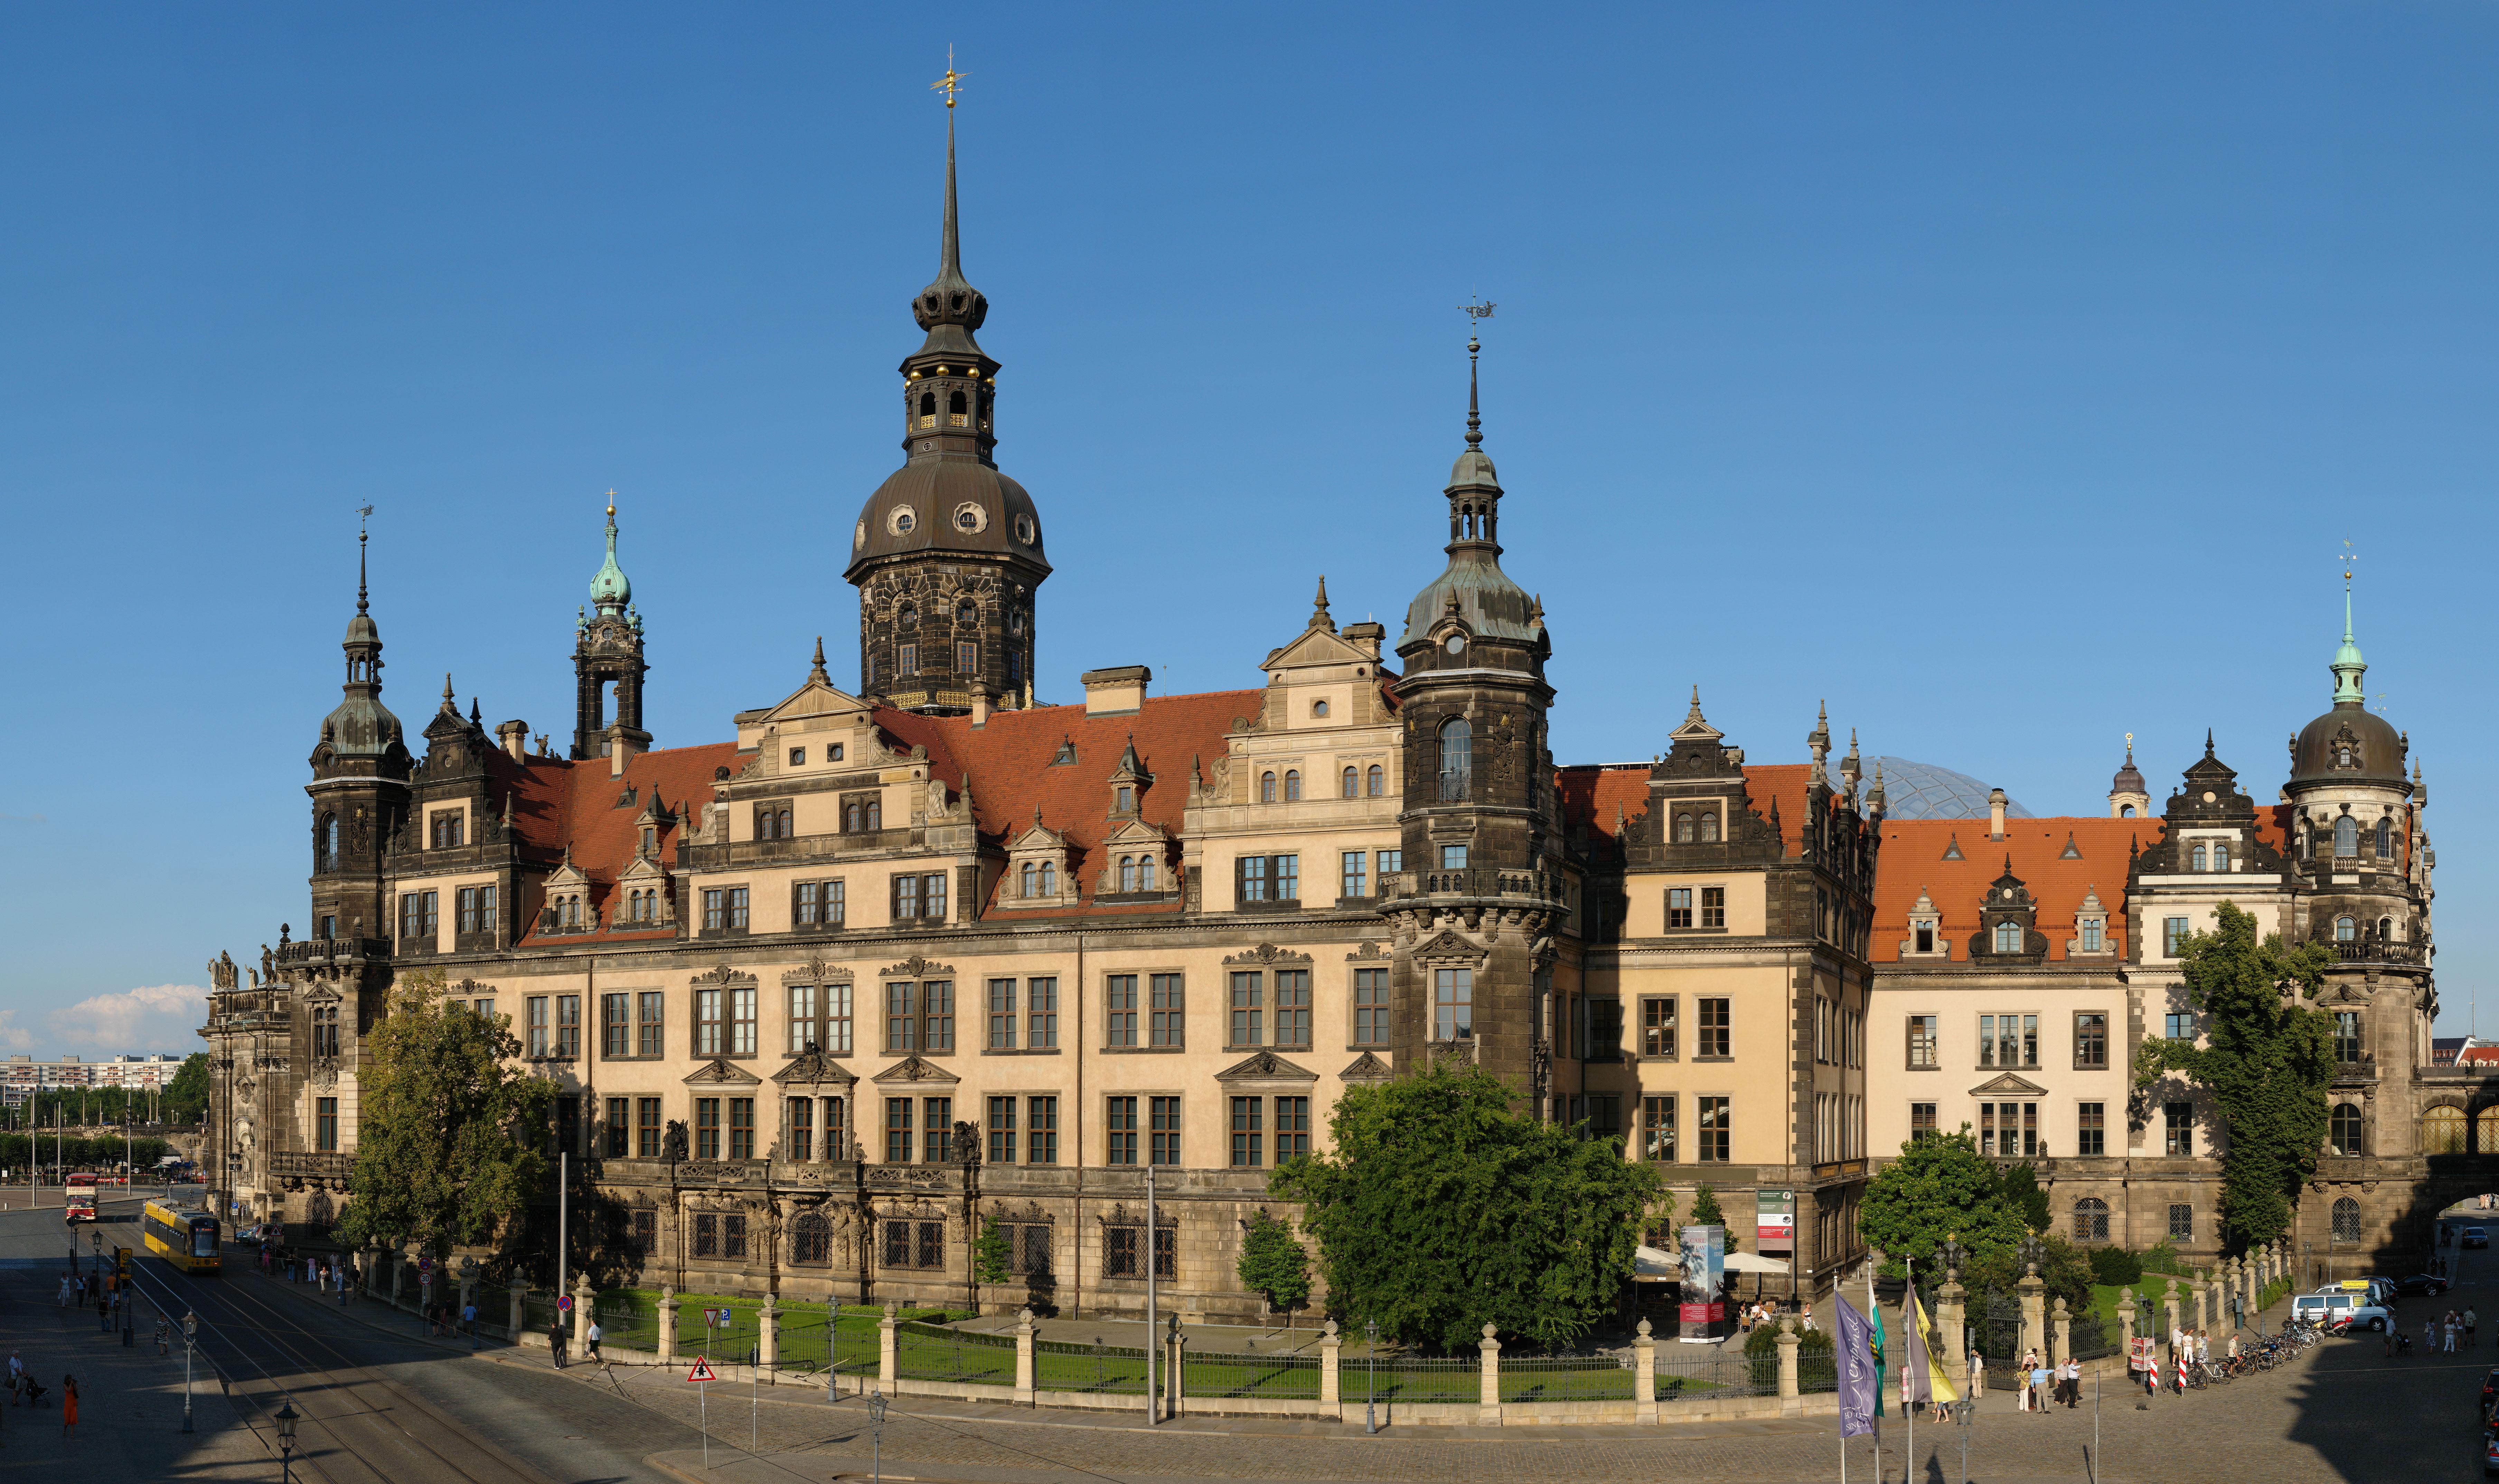 FileDD Schloss Gp